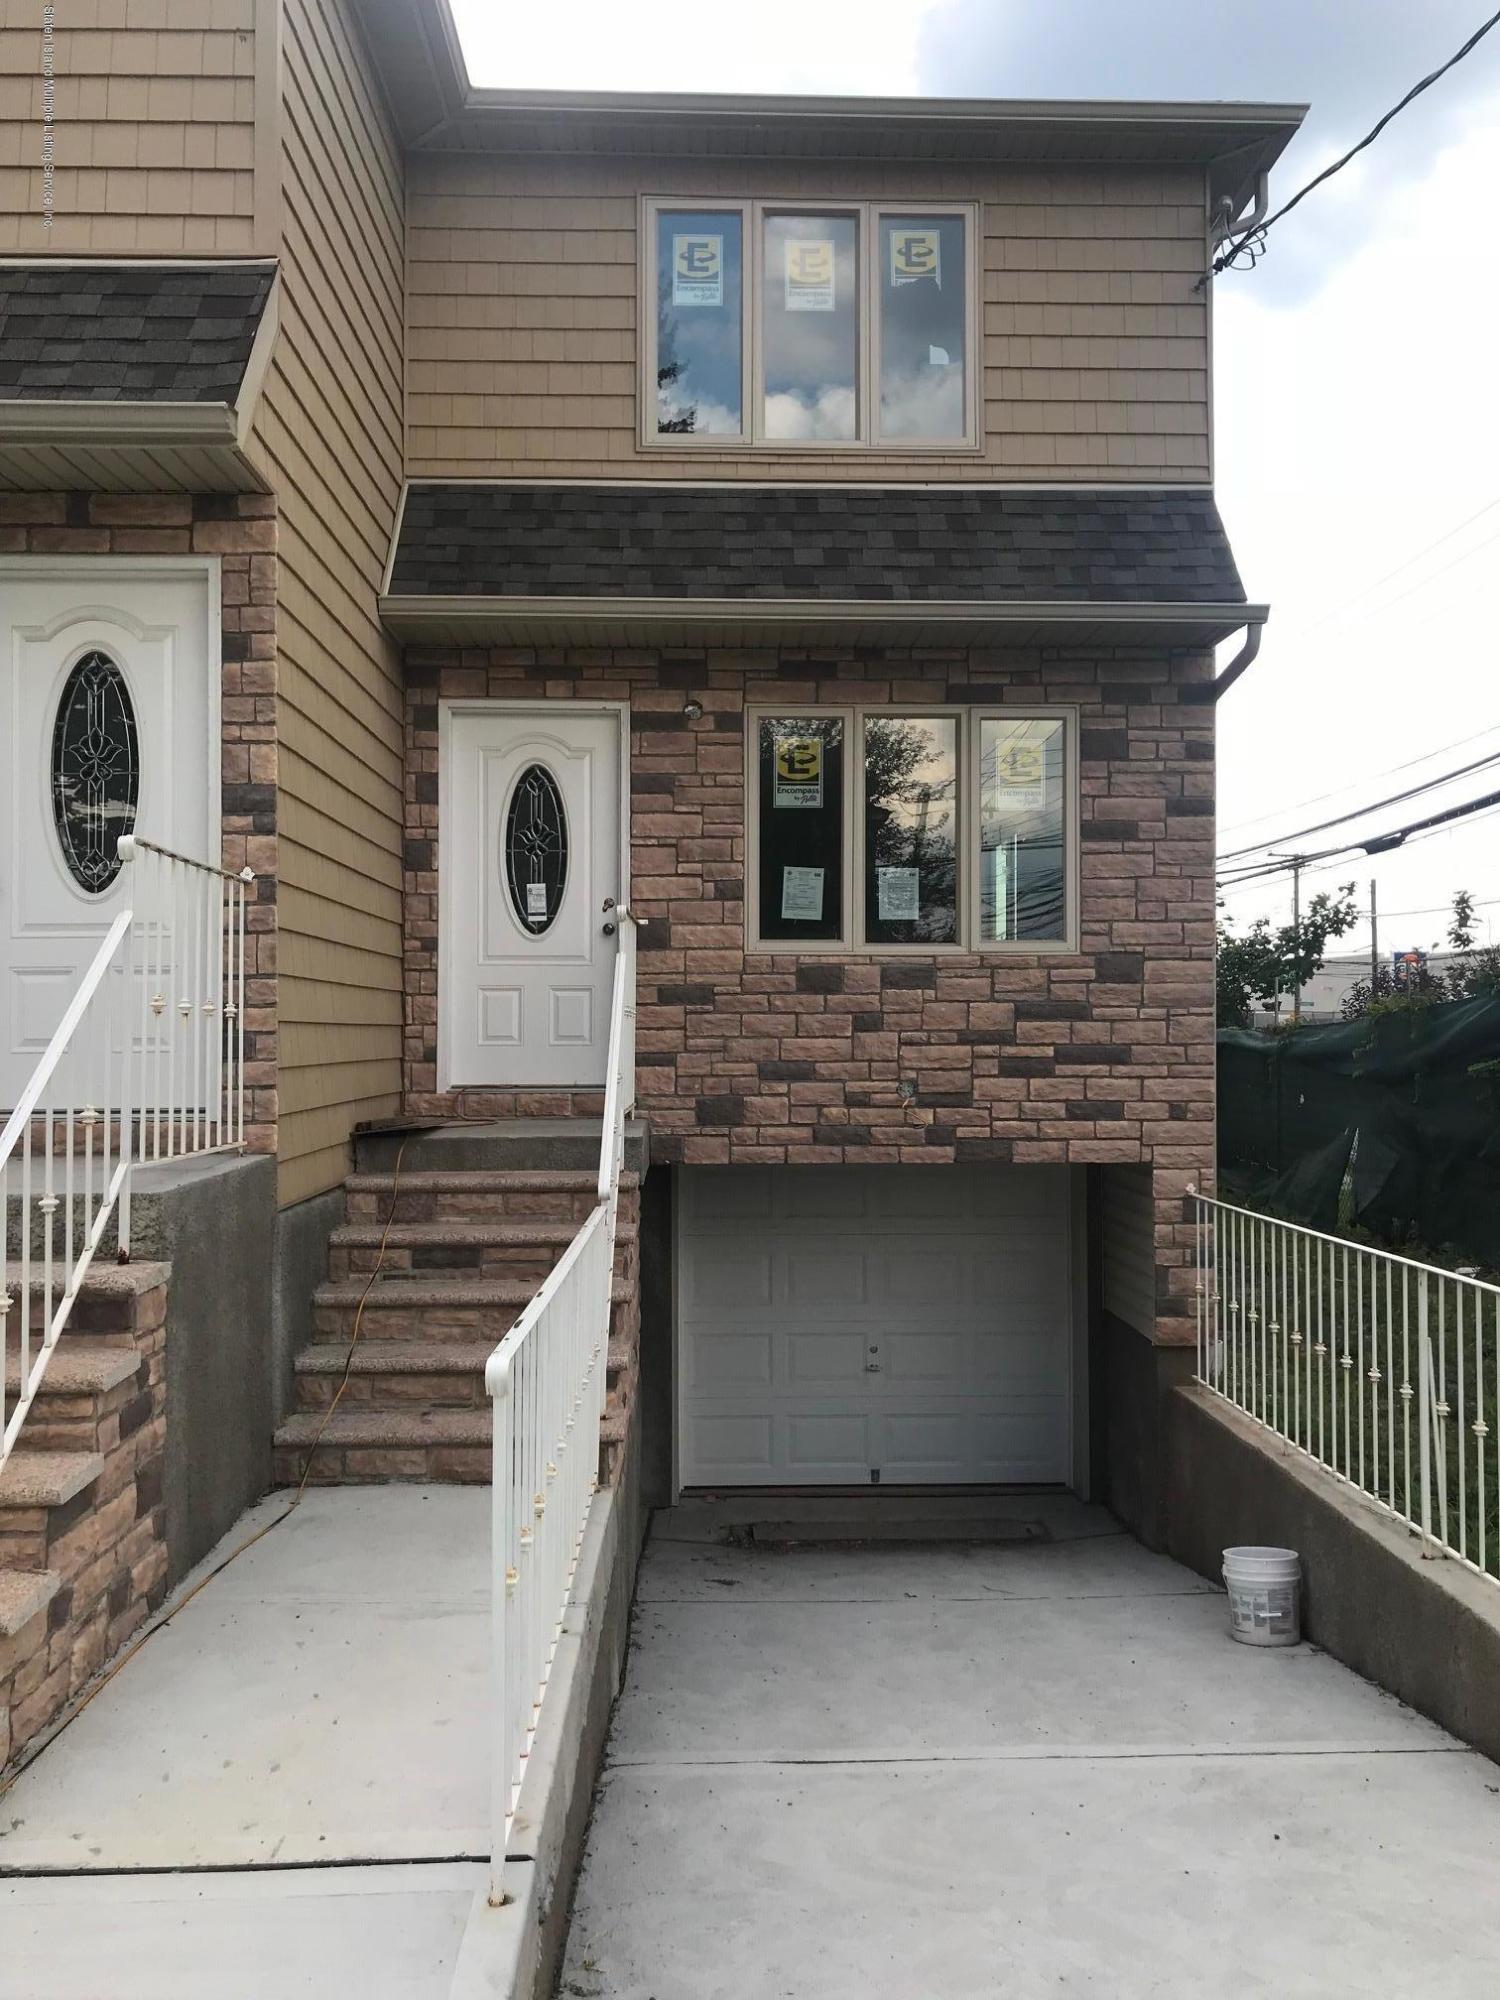 4 Summerfield Place,Staten Island,New York,10303,United States,3 Bedrooms Bedrooms,6 Rooms Rooms,4 BathroomsBathrooms,Residential,Summerfield,1124241